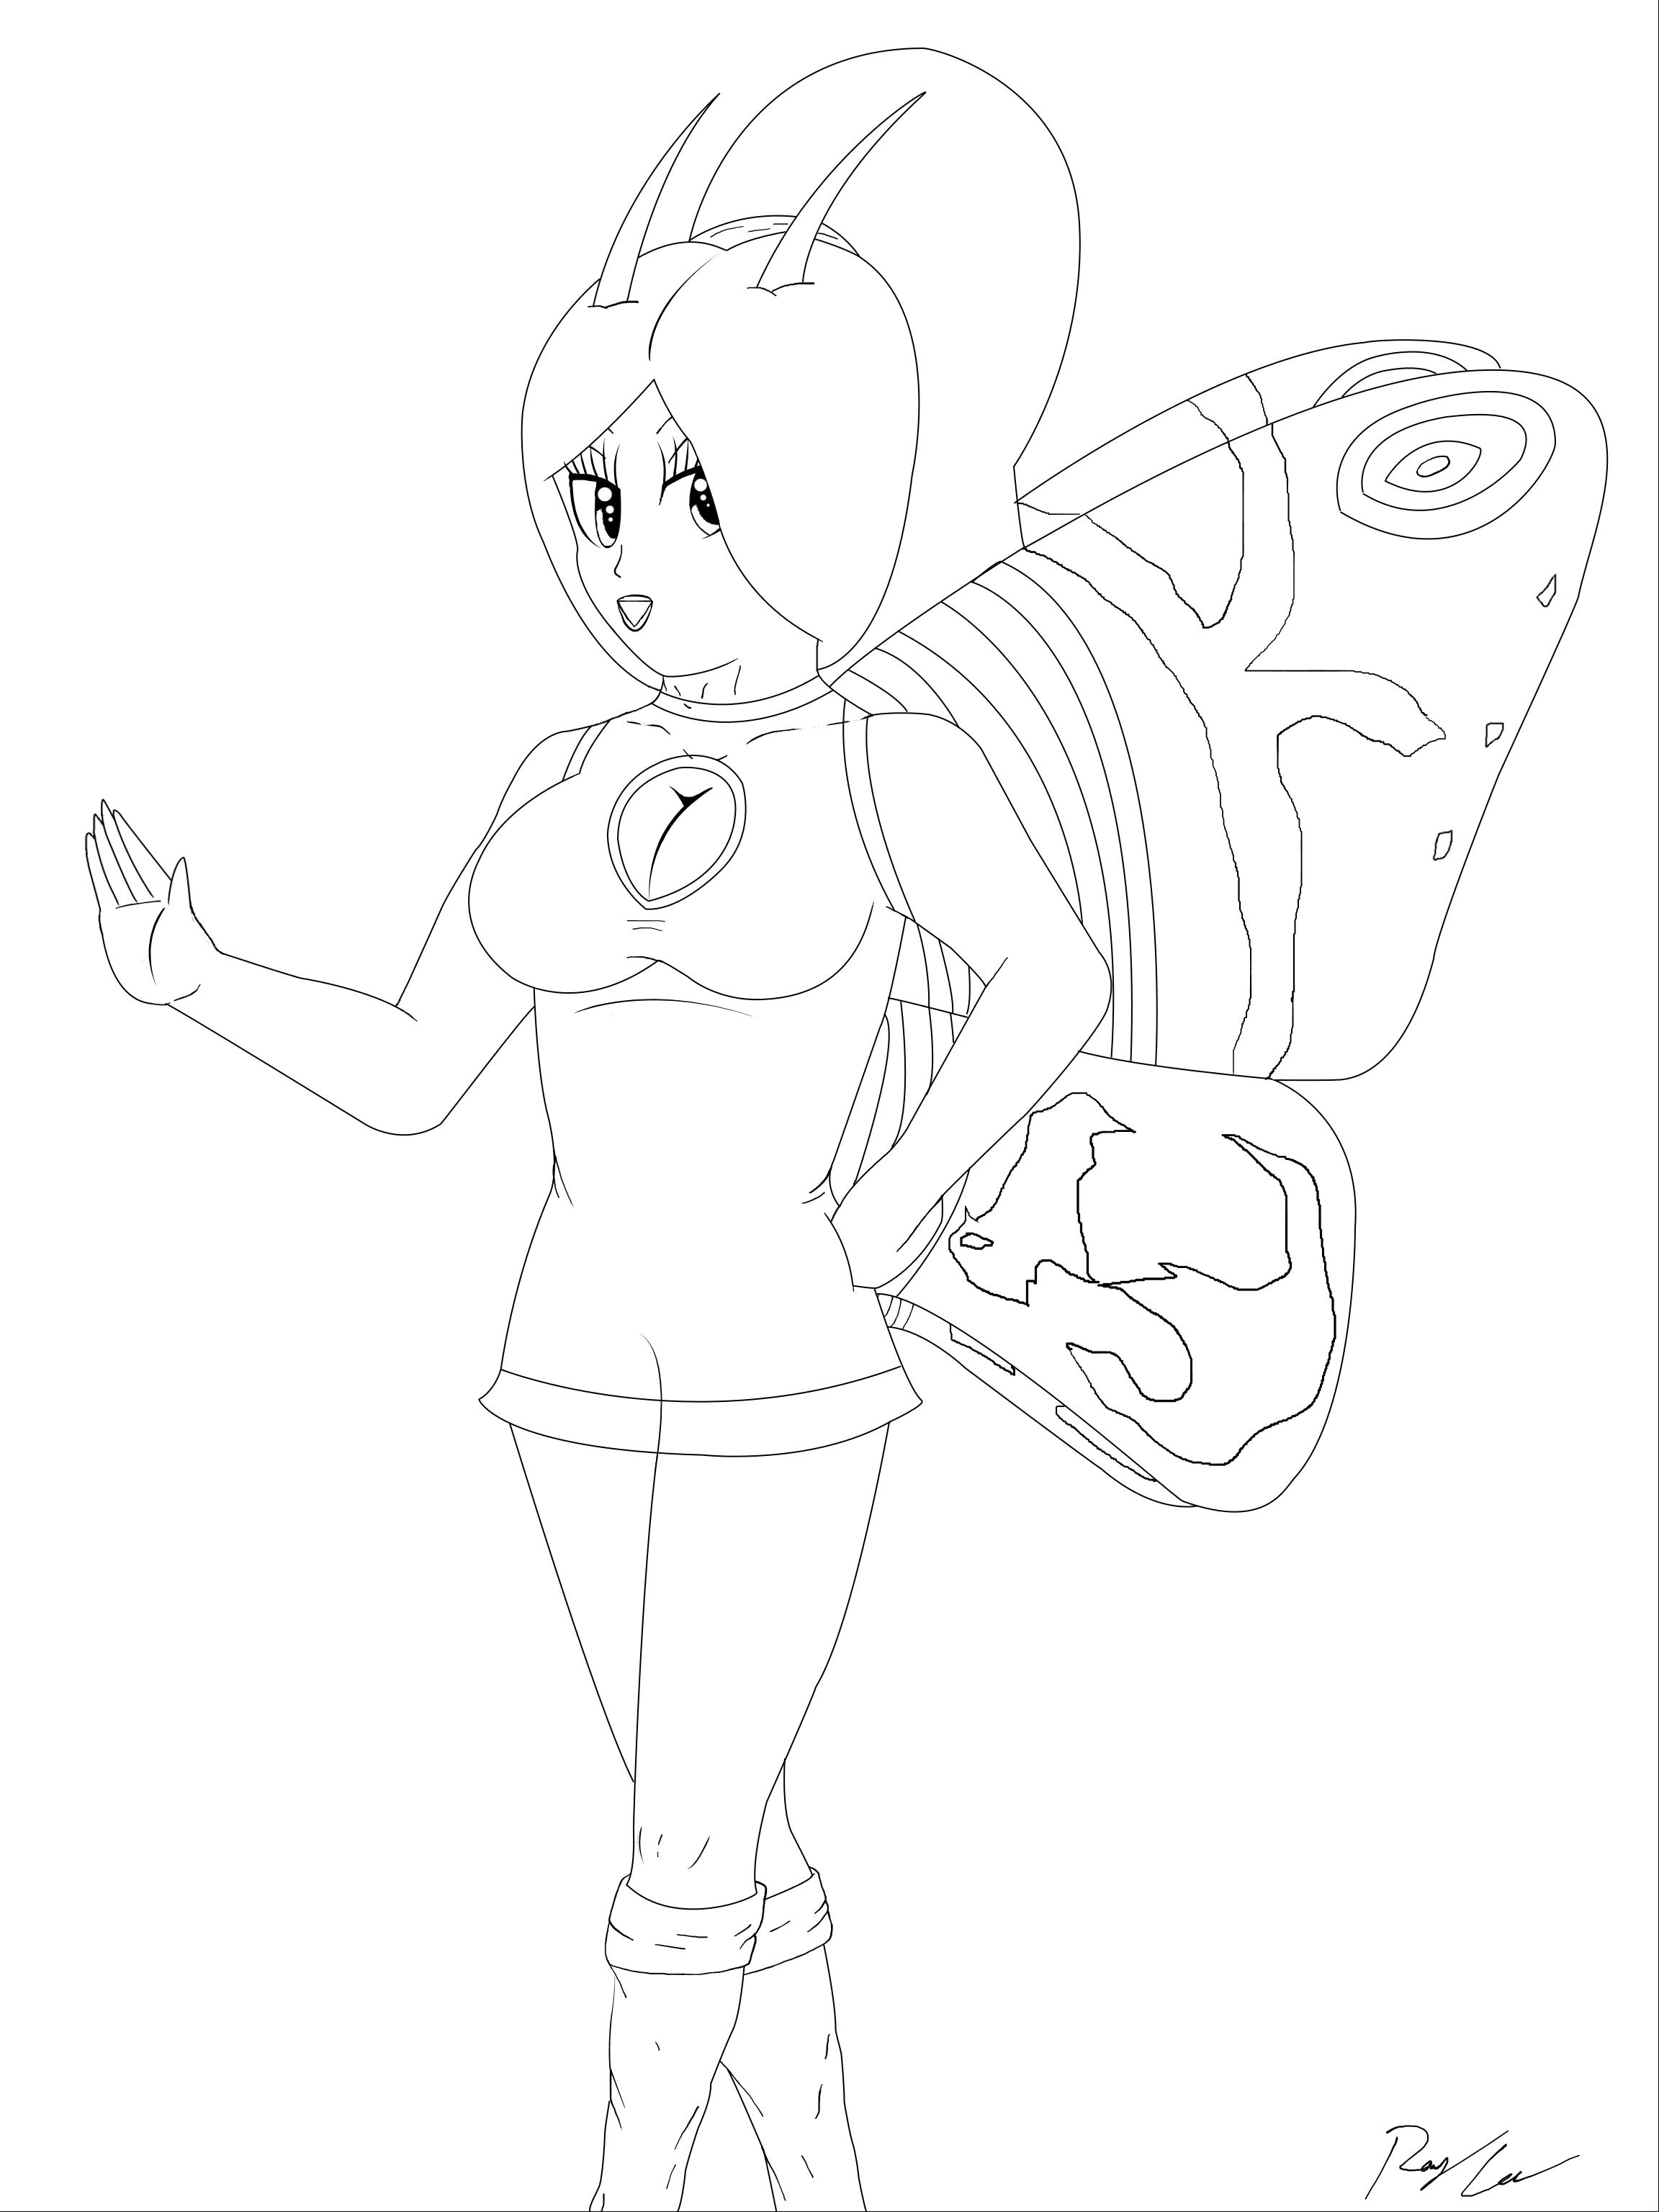 Mothra lineart